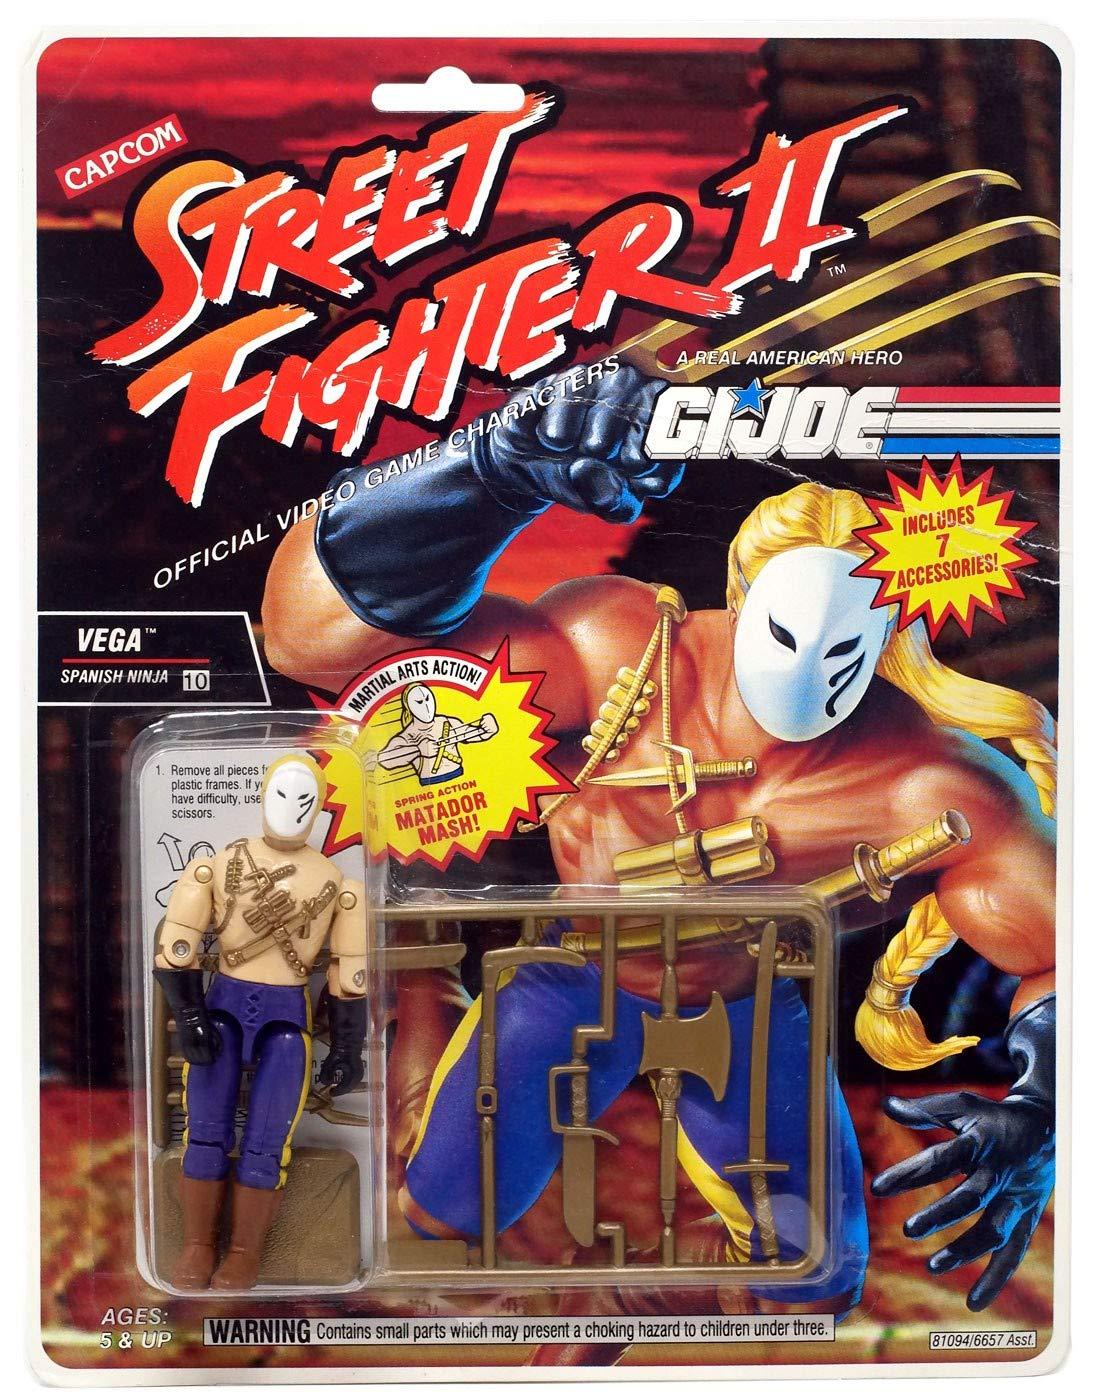 GI Joe Street Fighter II Vega Spanish Ninja 3 3/4